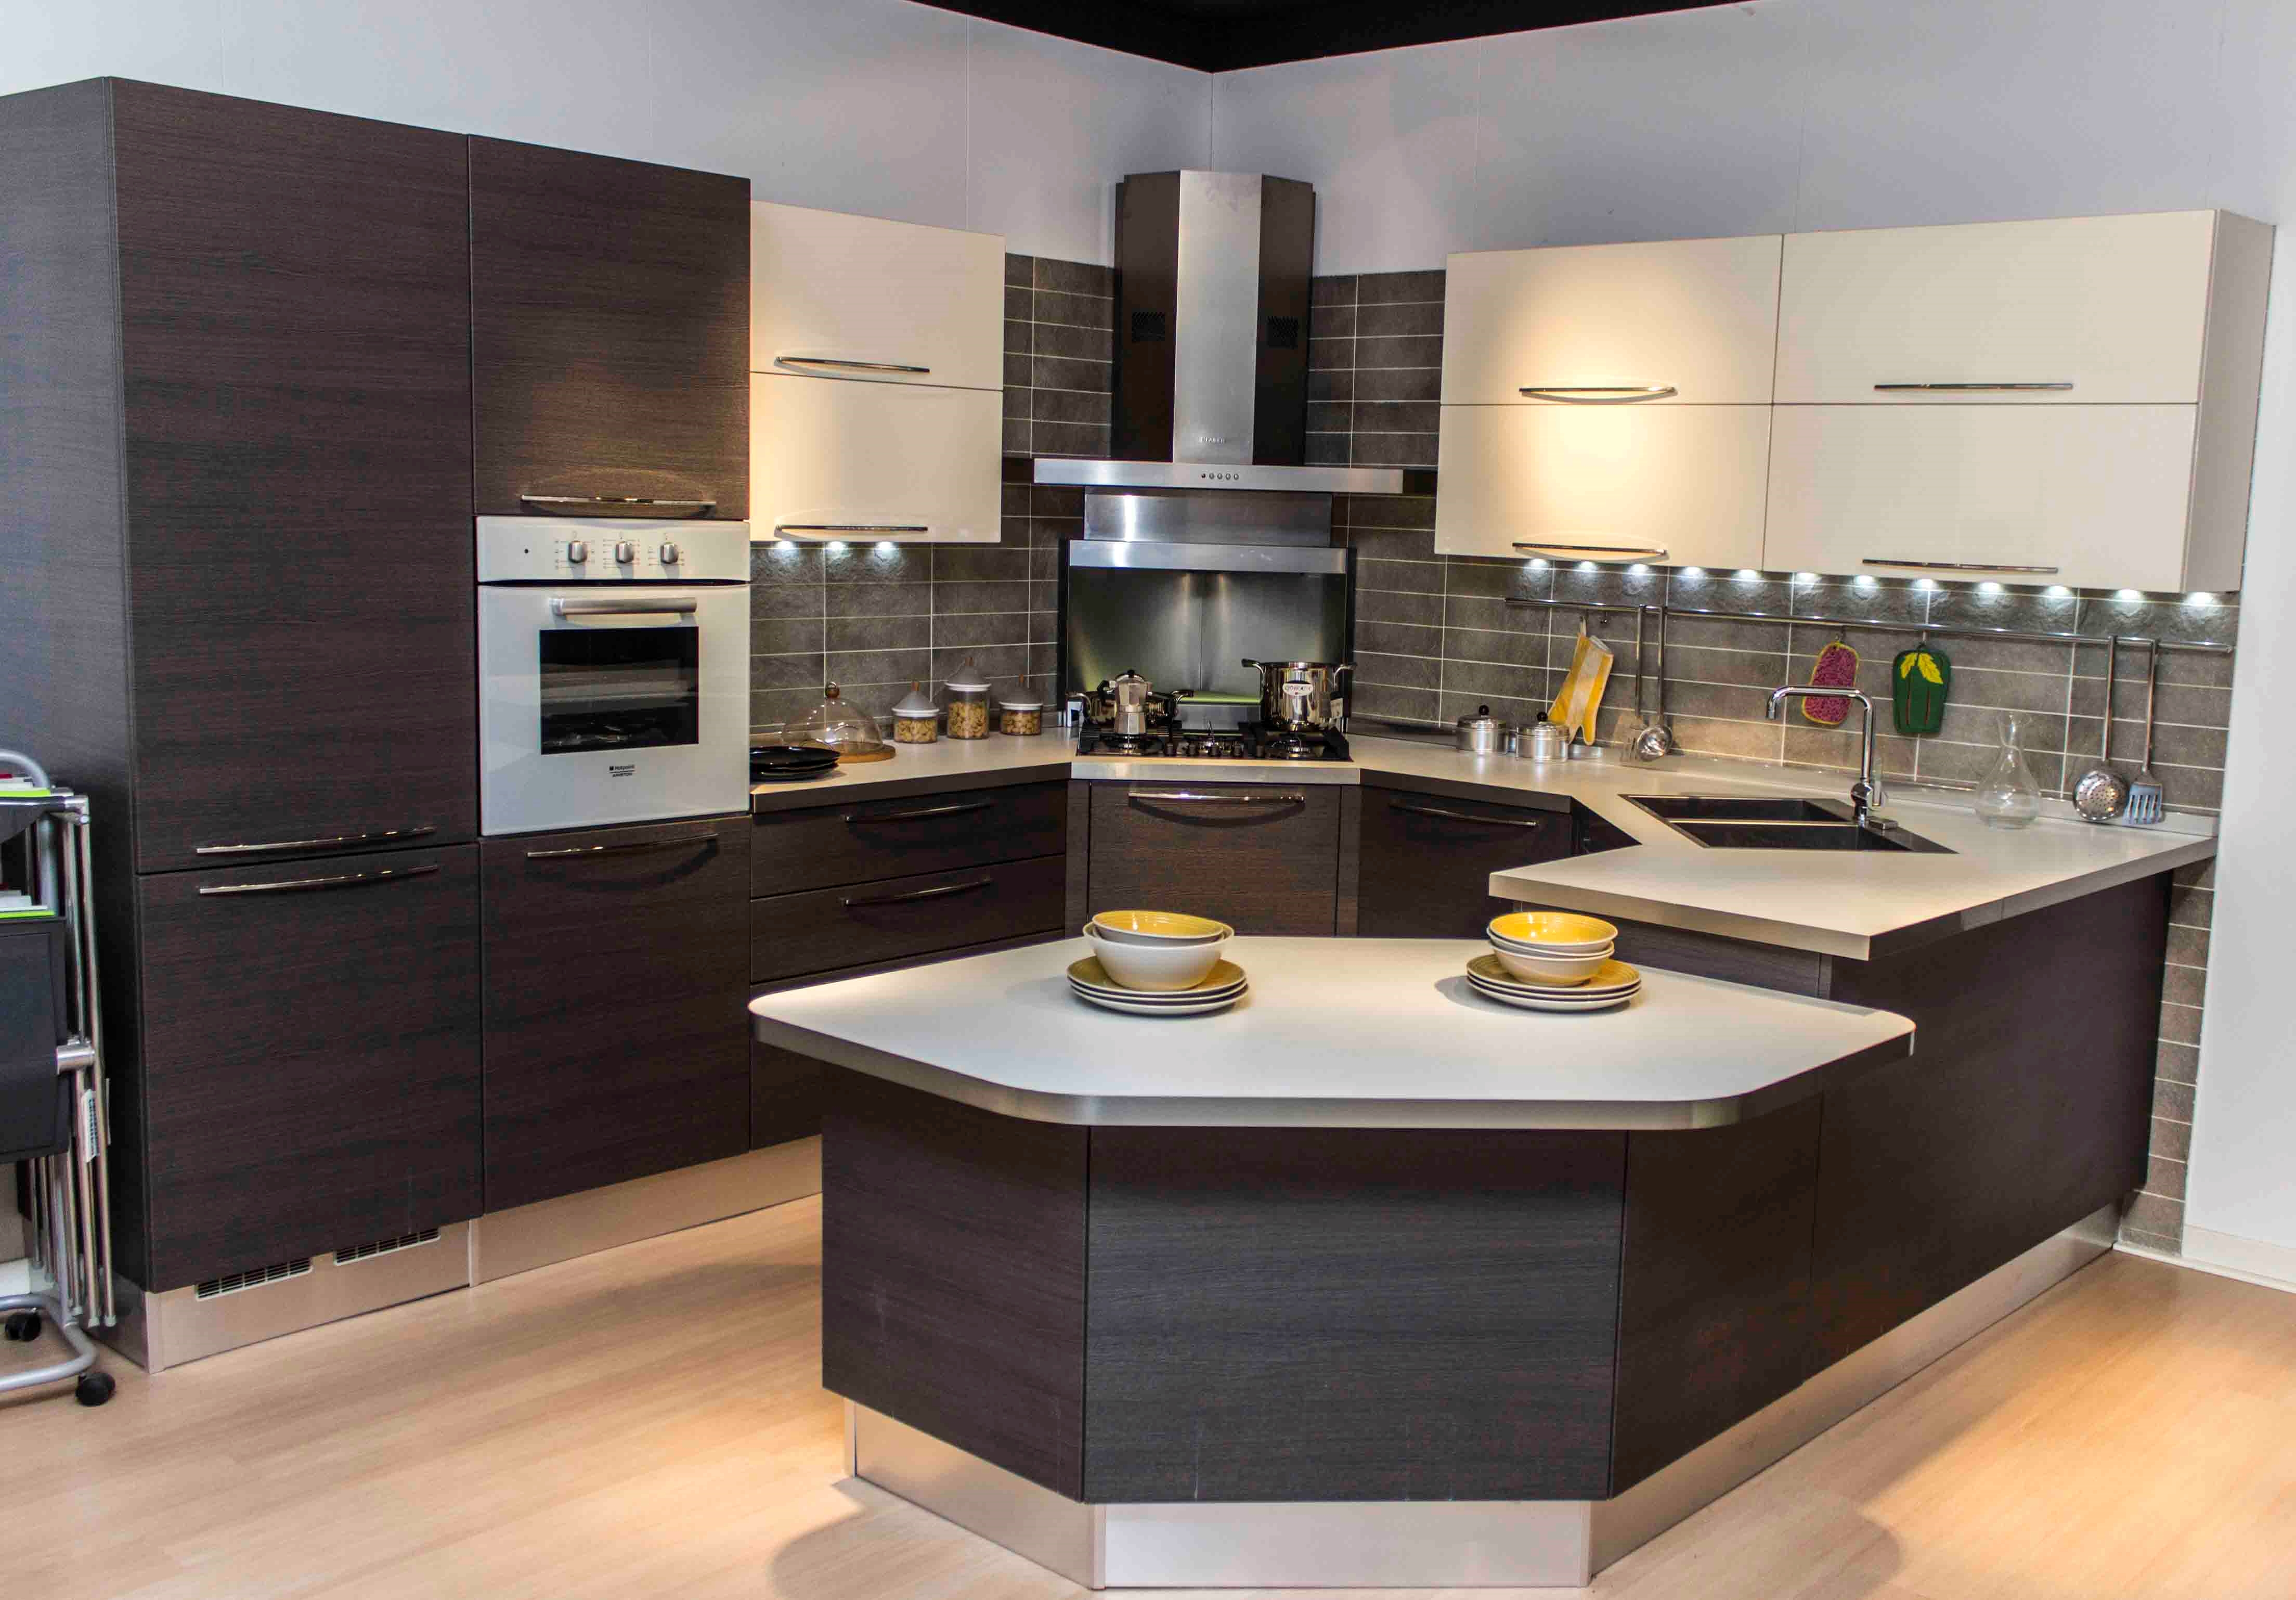 Best Modelli Veneta Cucine Pictures - Home Design Ideas 2017 ...